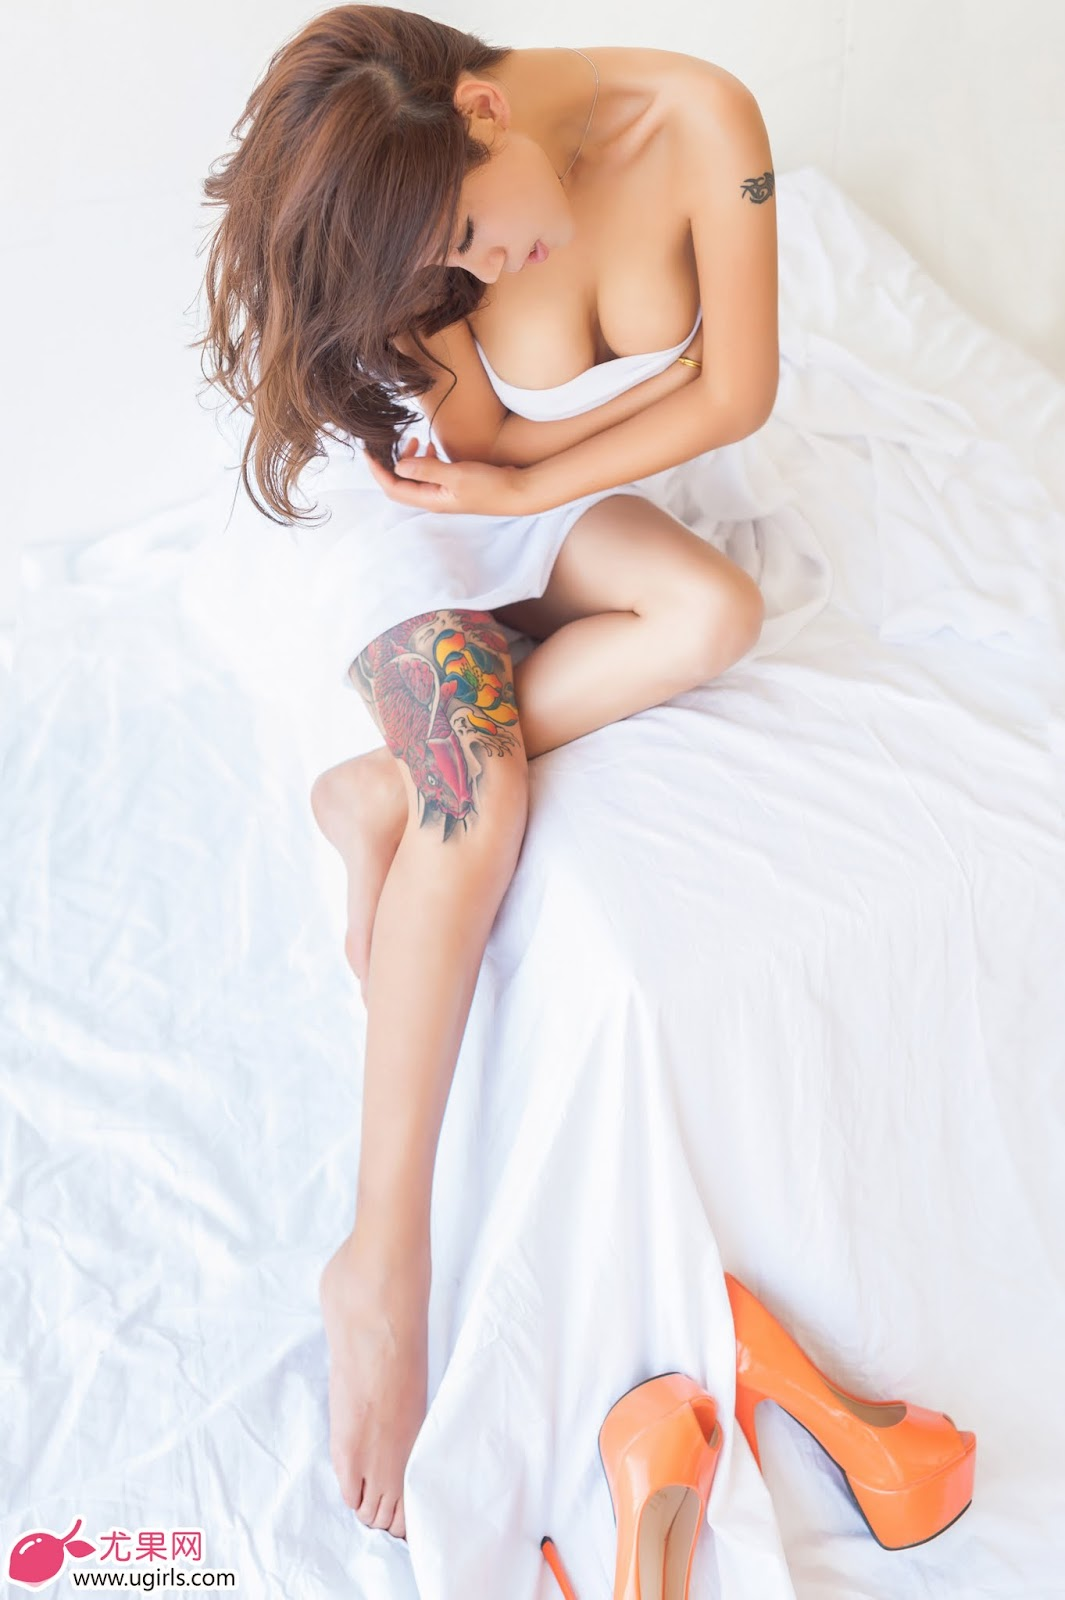 DLS 0348 - Hot Girl Ugirls No.021 Model: 田依依